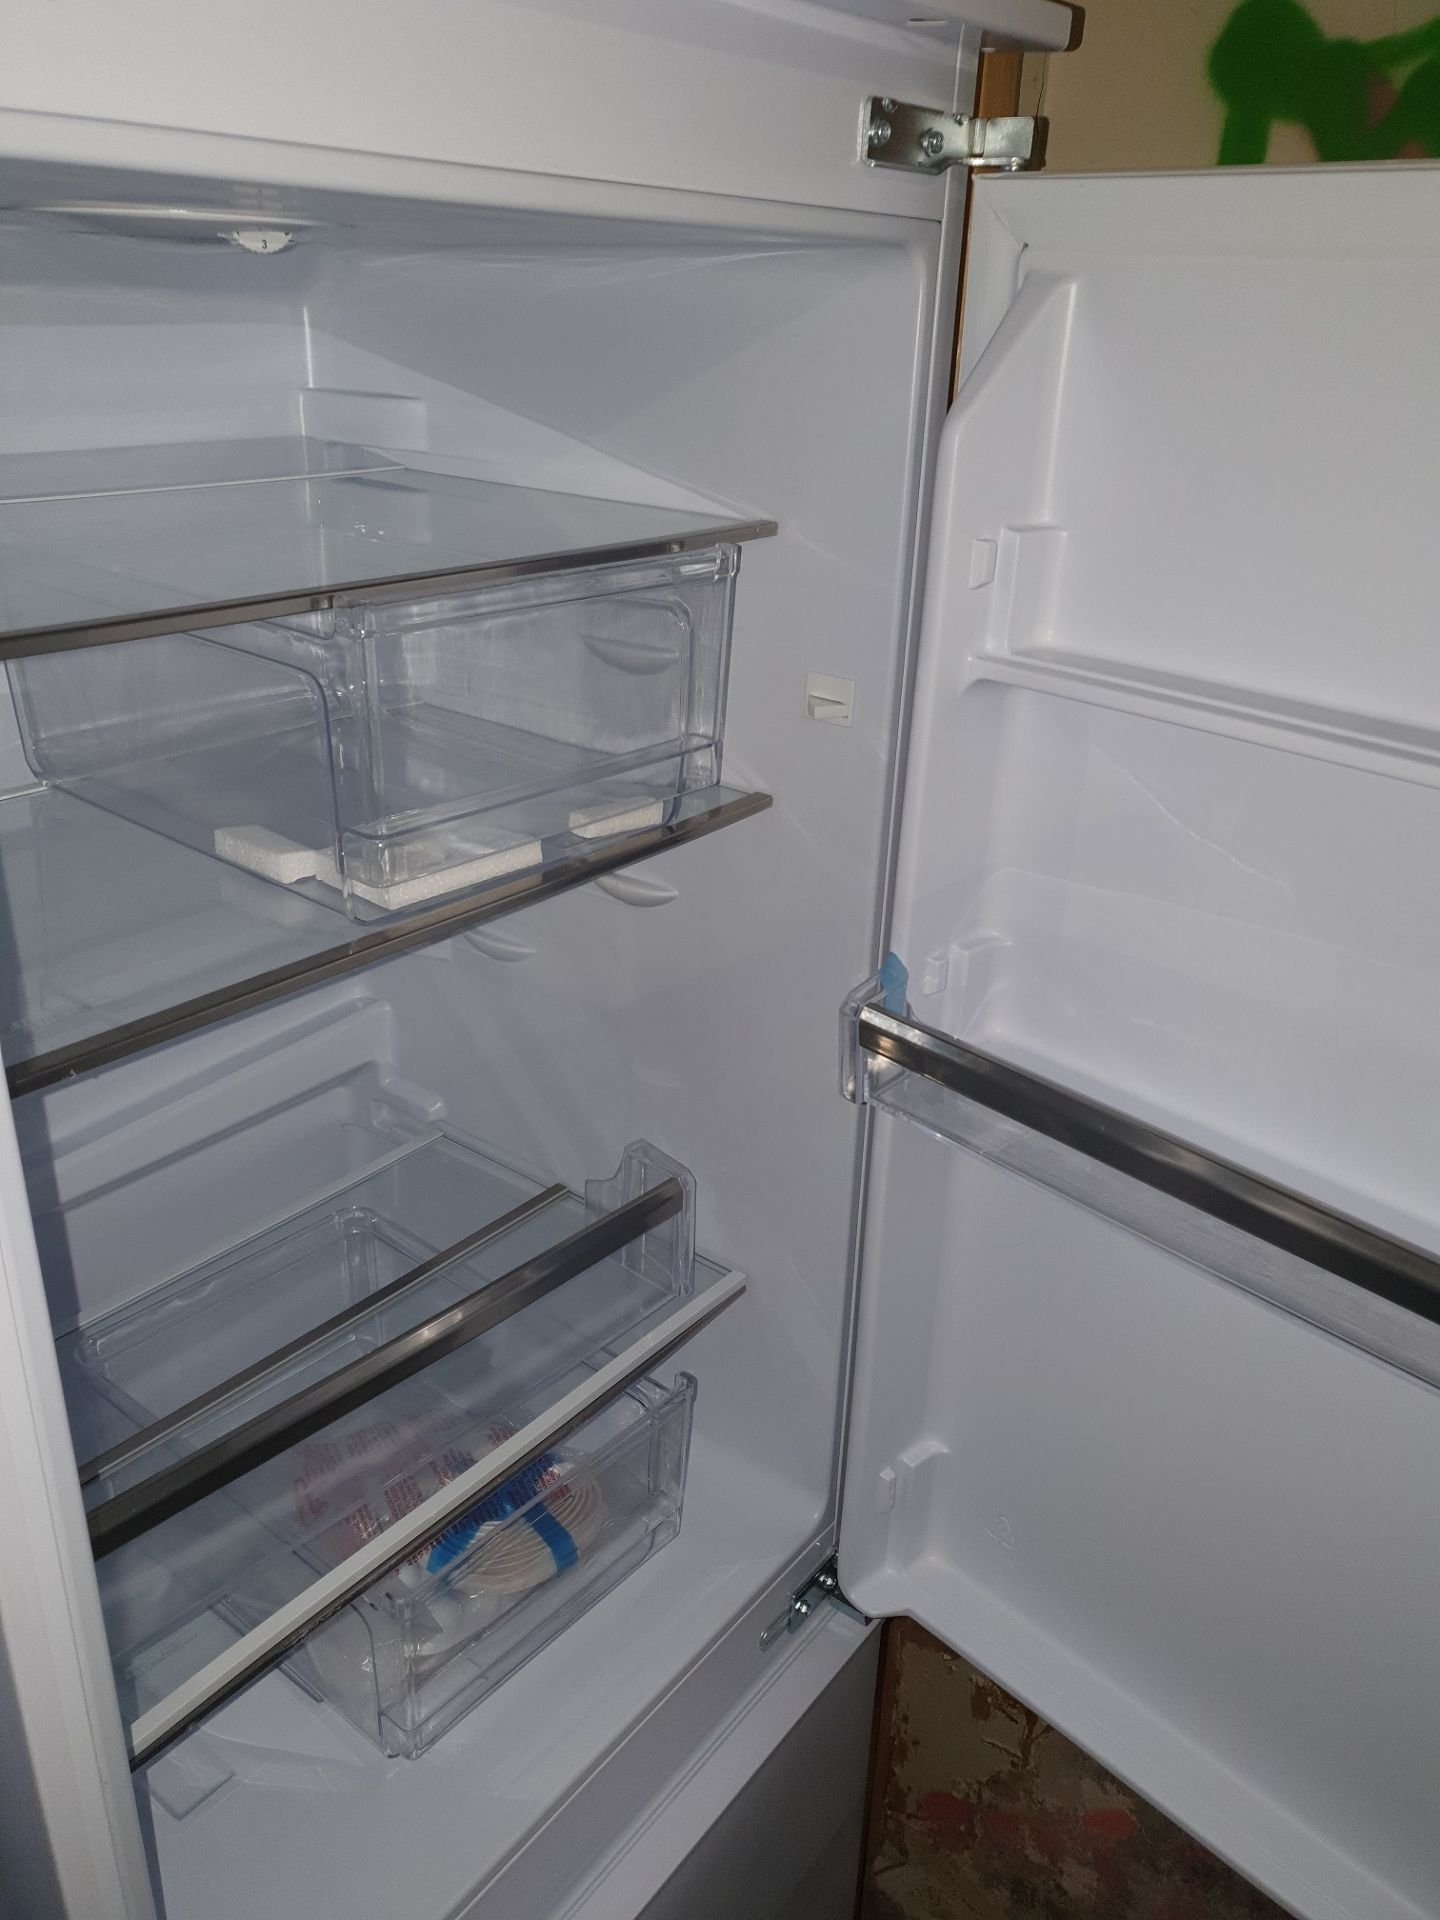 NEW/GRADED AND UNPACKAGED Zanussi ZBB28441SV Integrated 70/30 Fridge Freezer (Brand new slight - Image 9 of 14